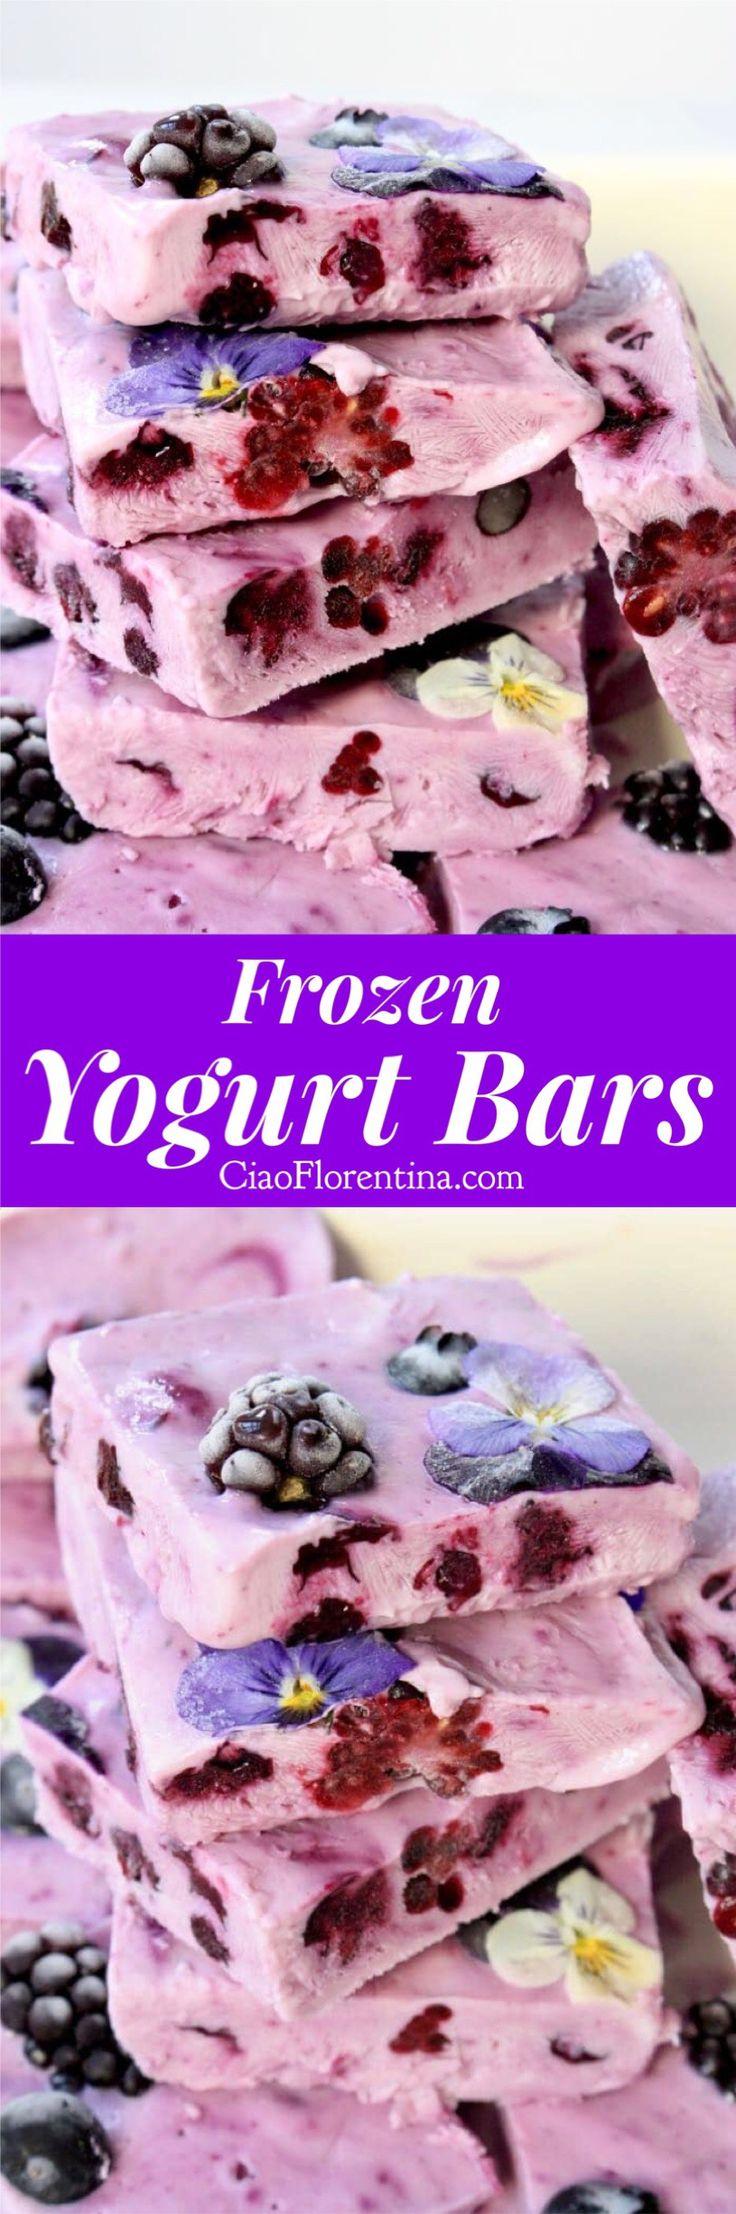 Healthy frozen yogurt bars made with sugar free, non fat creamy Greek yogurt, wild honey and berries   CiaoFlorentina.com @CiaoFlorentina